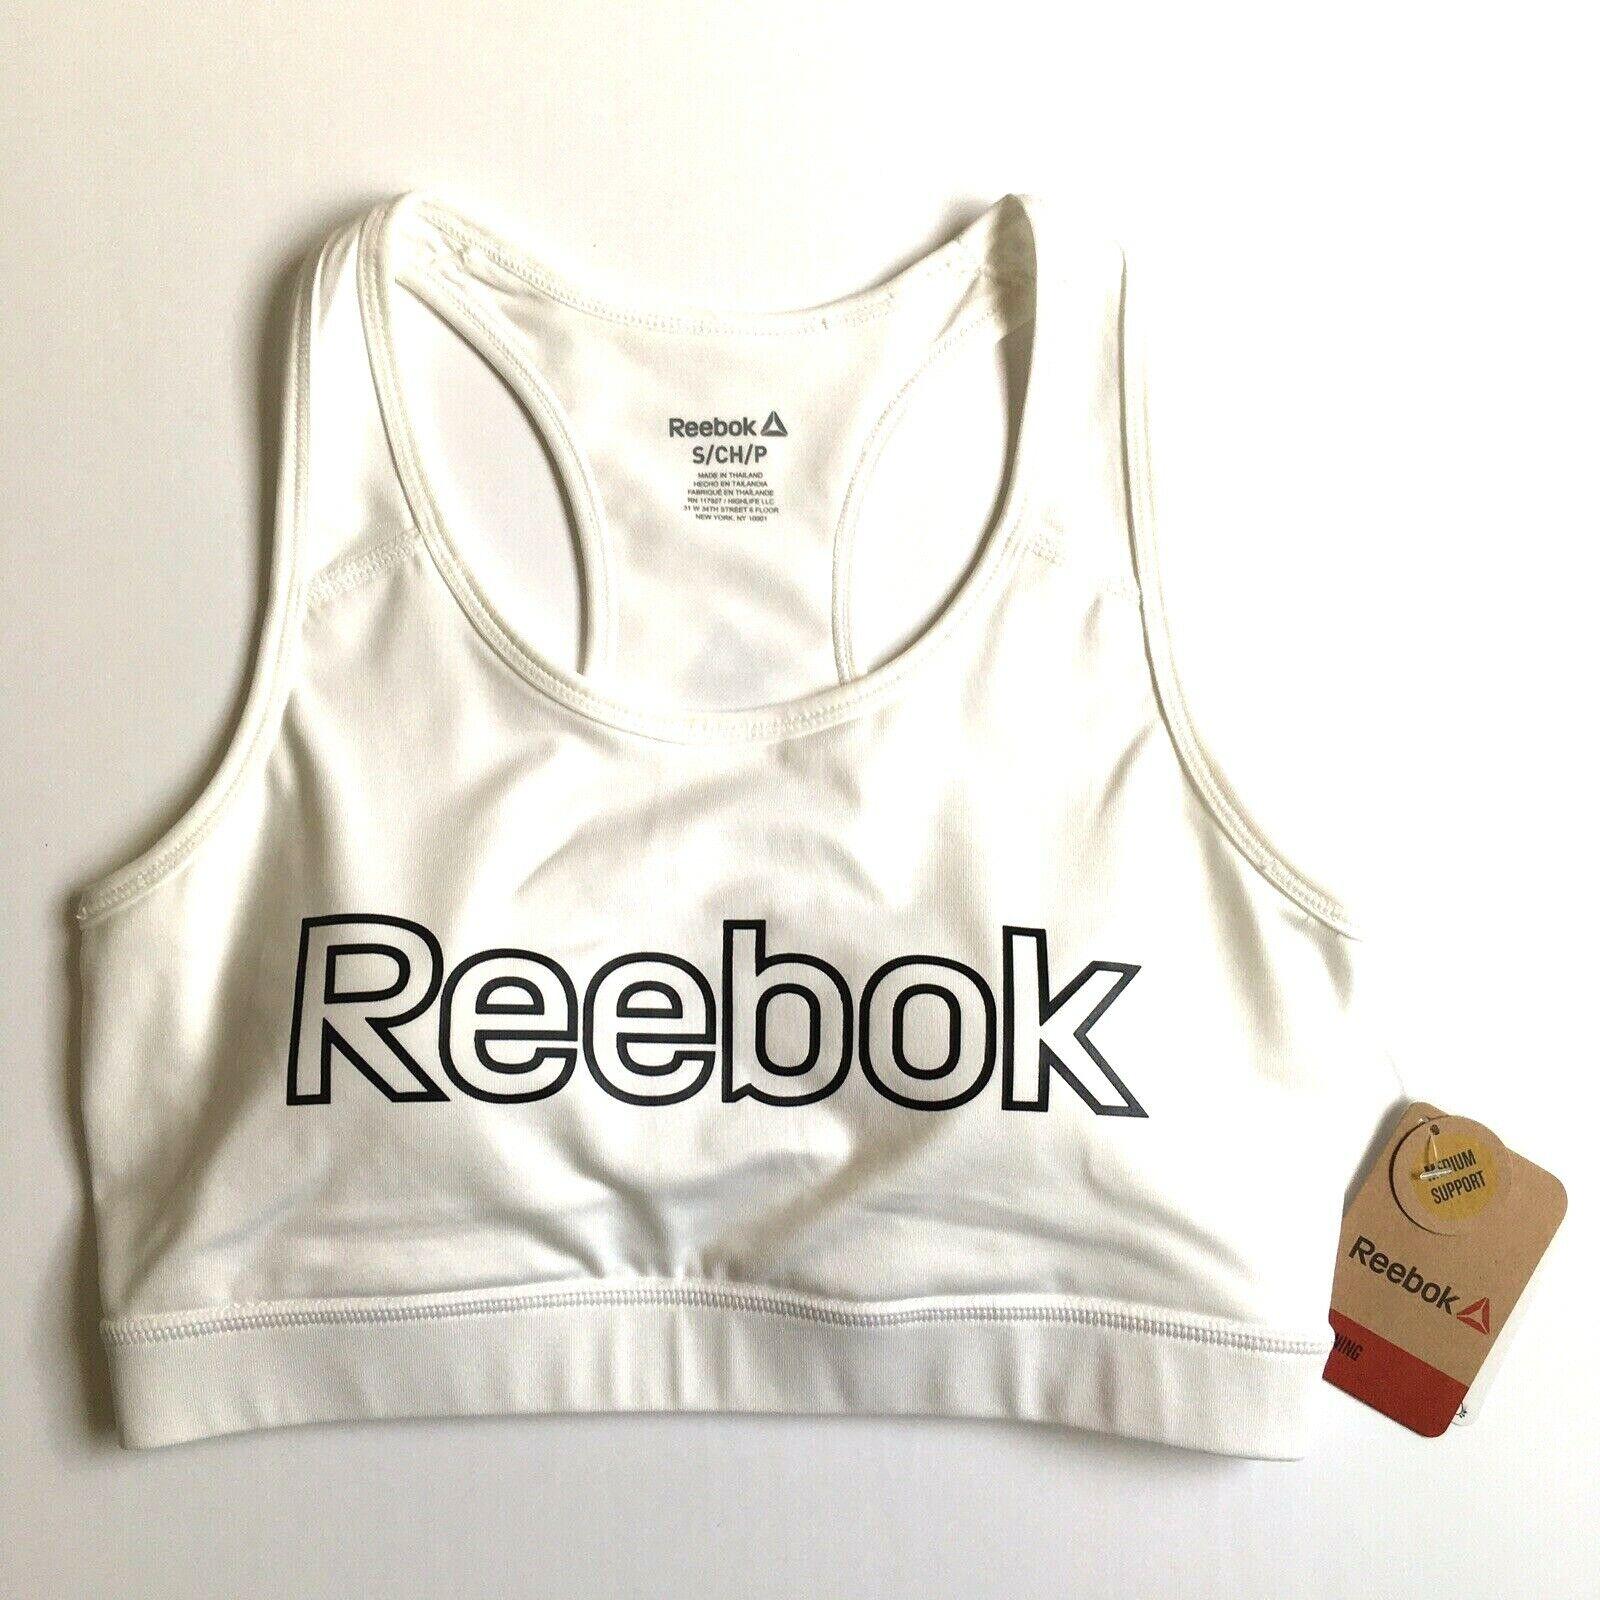 Reebok Women's Sport Bra Top Size S White